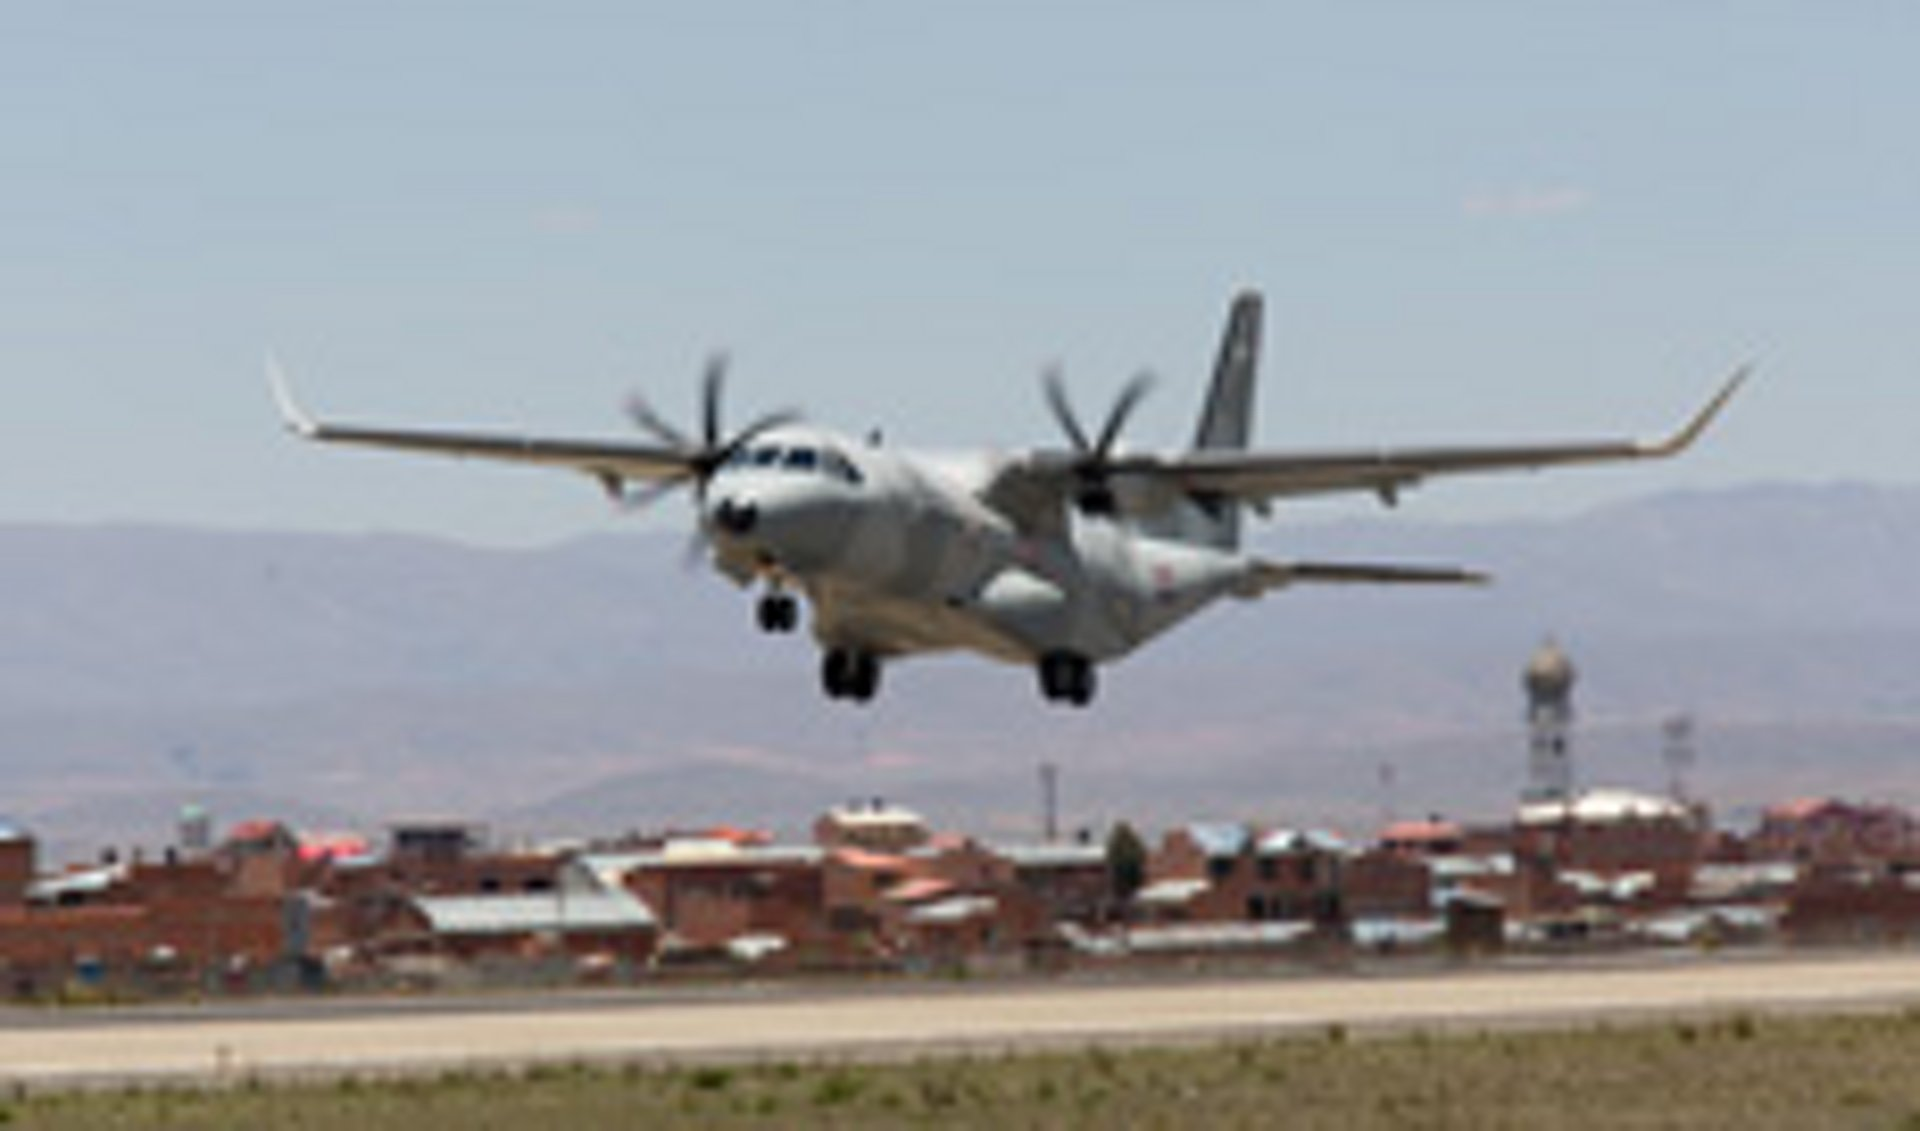 C295W at La Paz, Bolivia